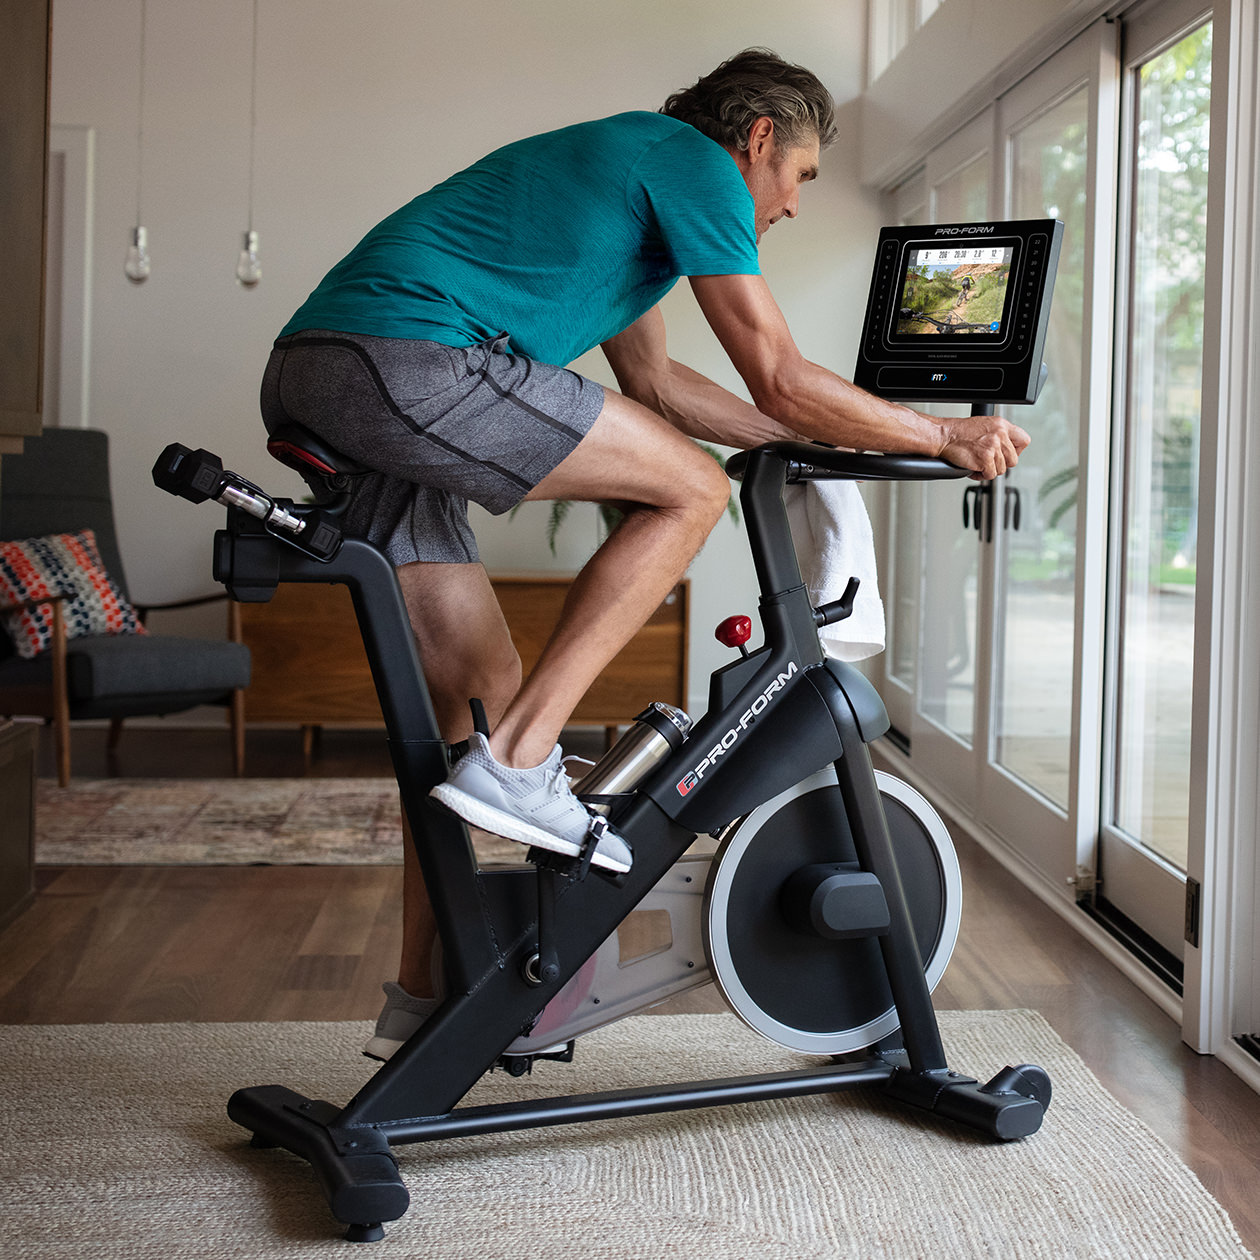 Proform ProForm Cycle Trainer gallery image 5